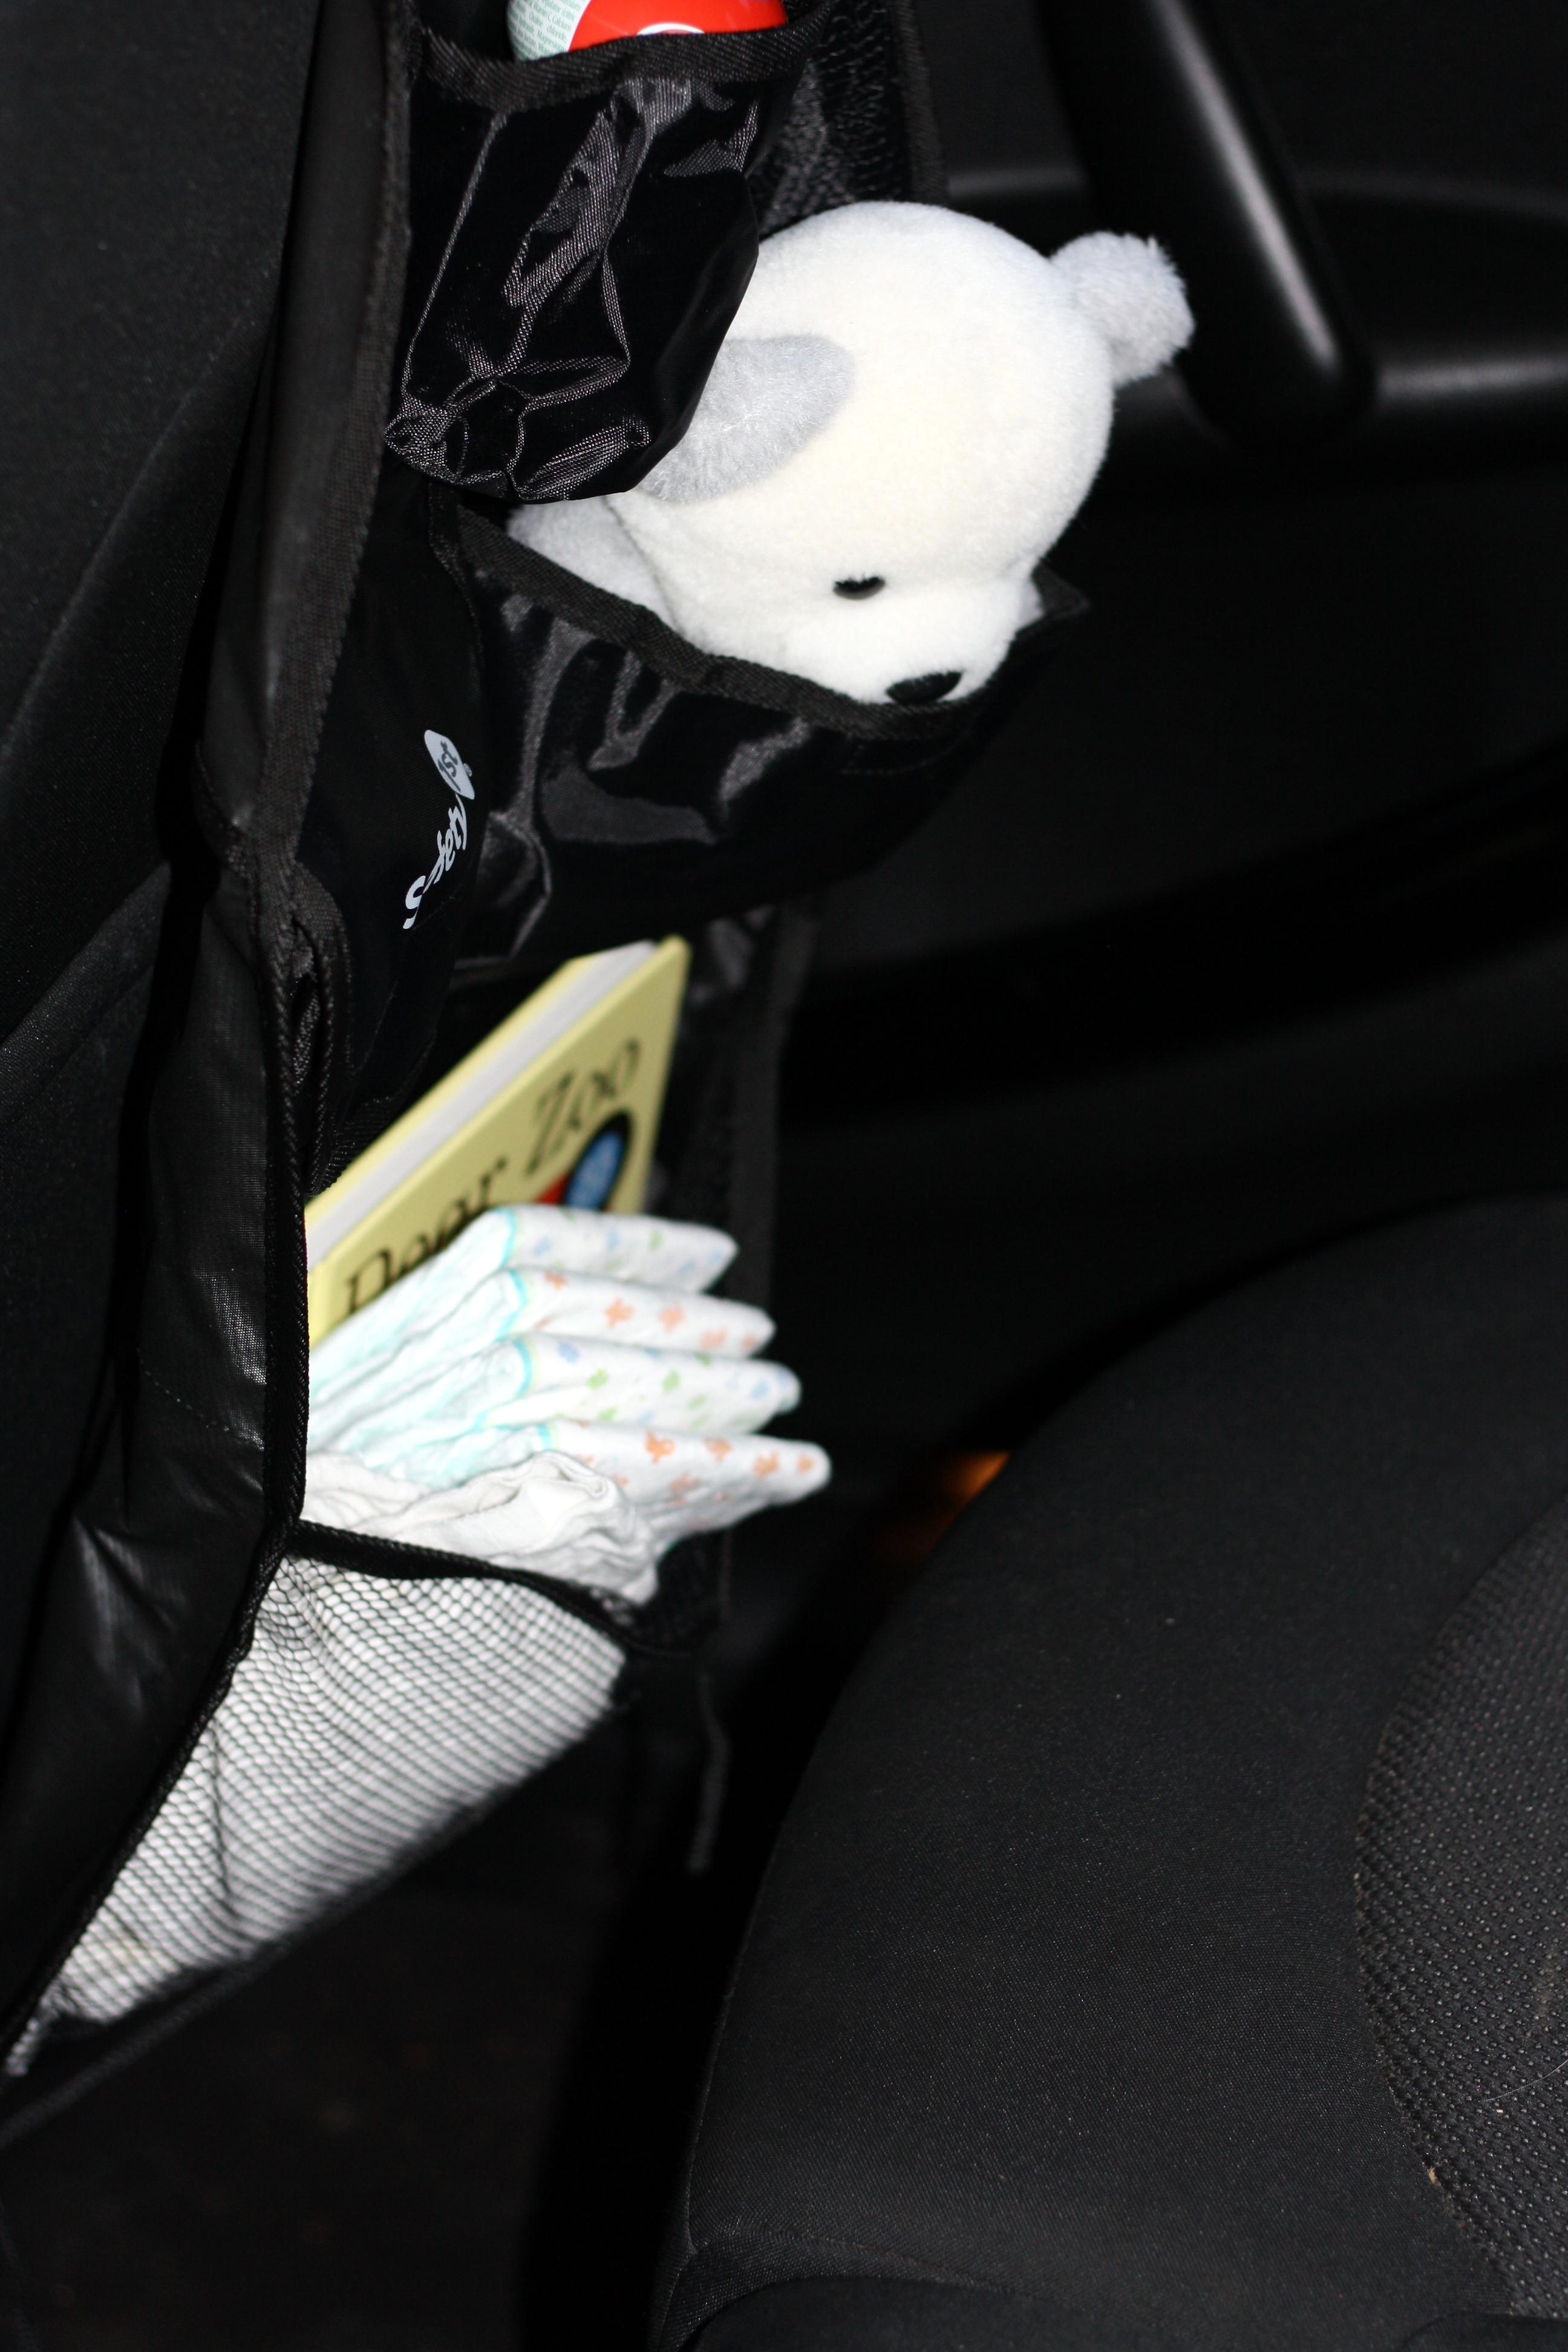 A Back Seat Organiser